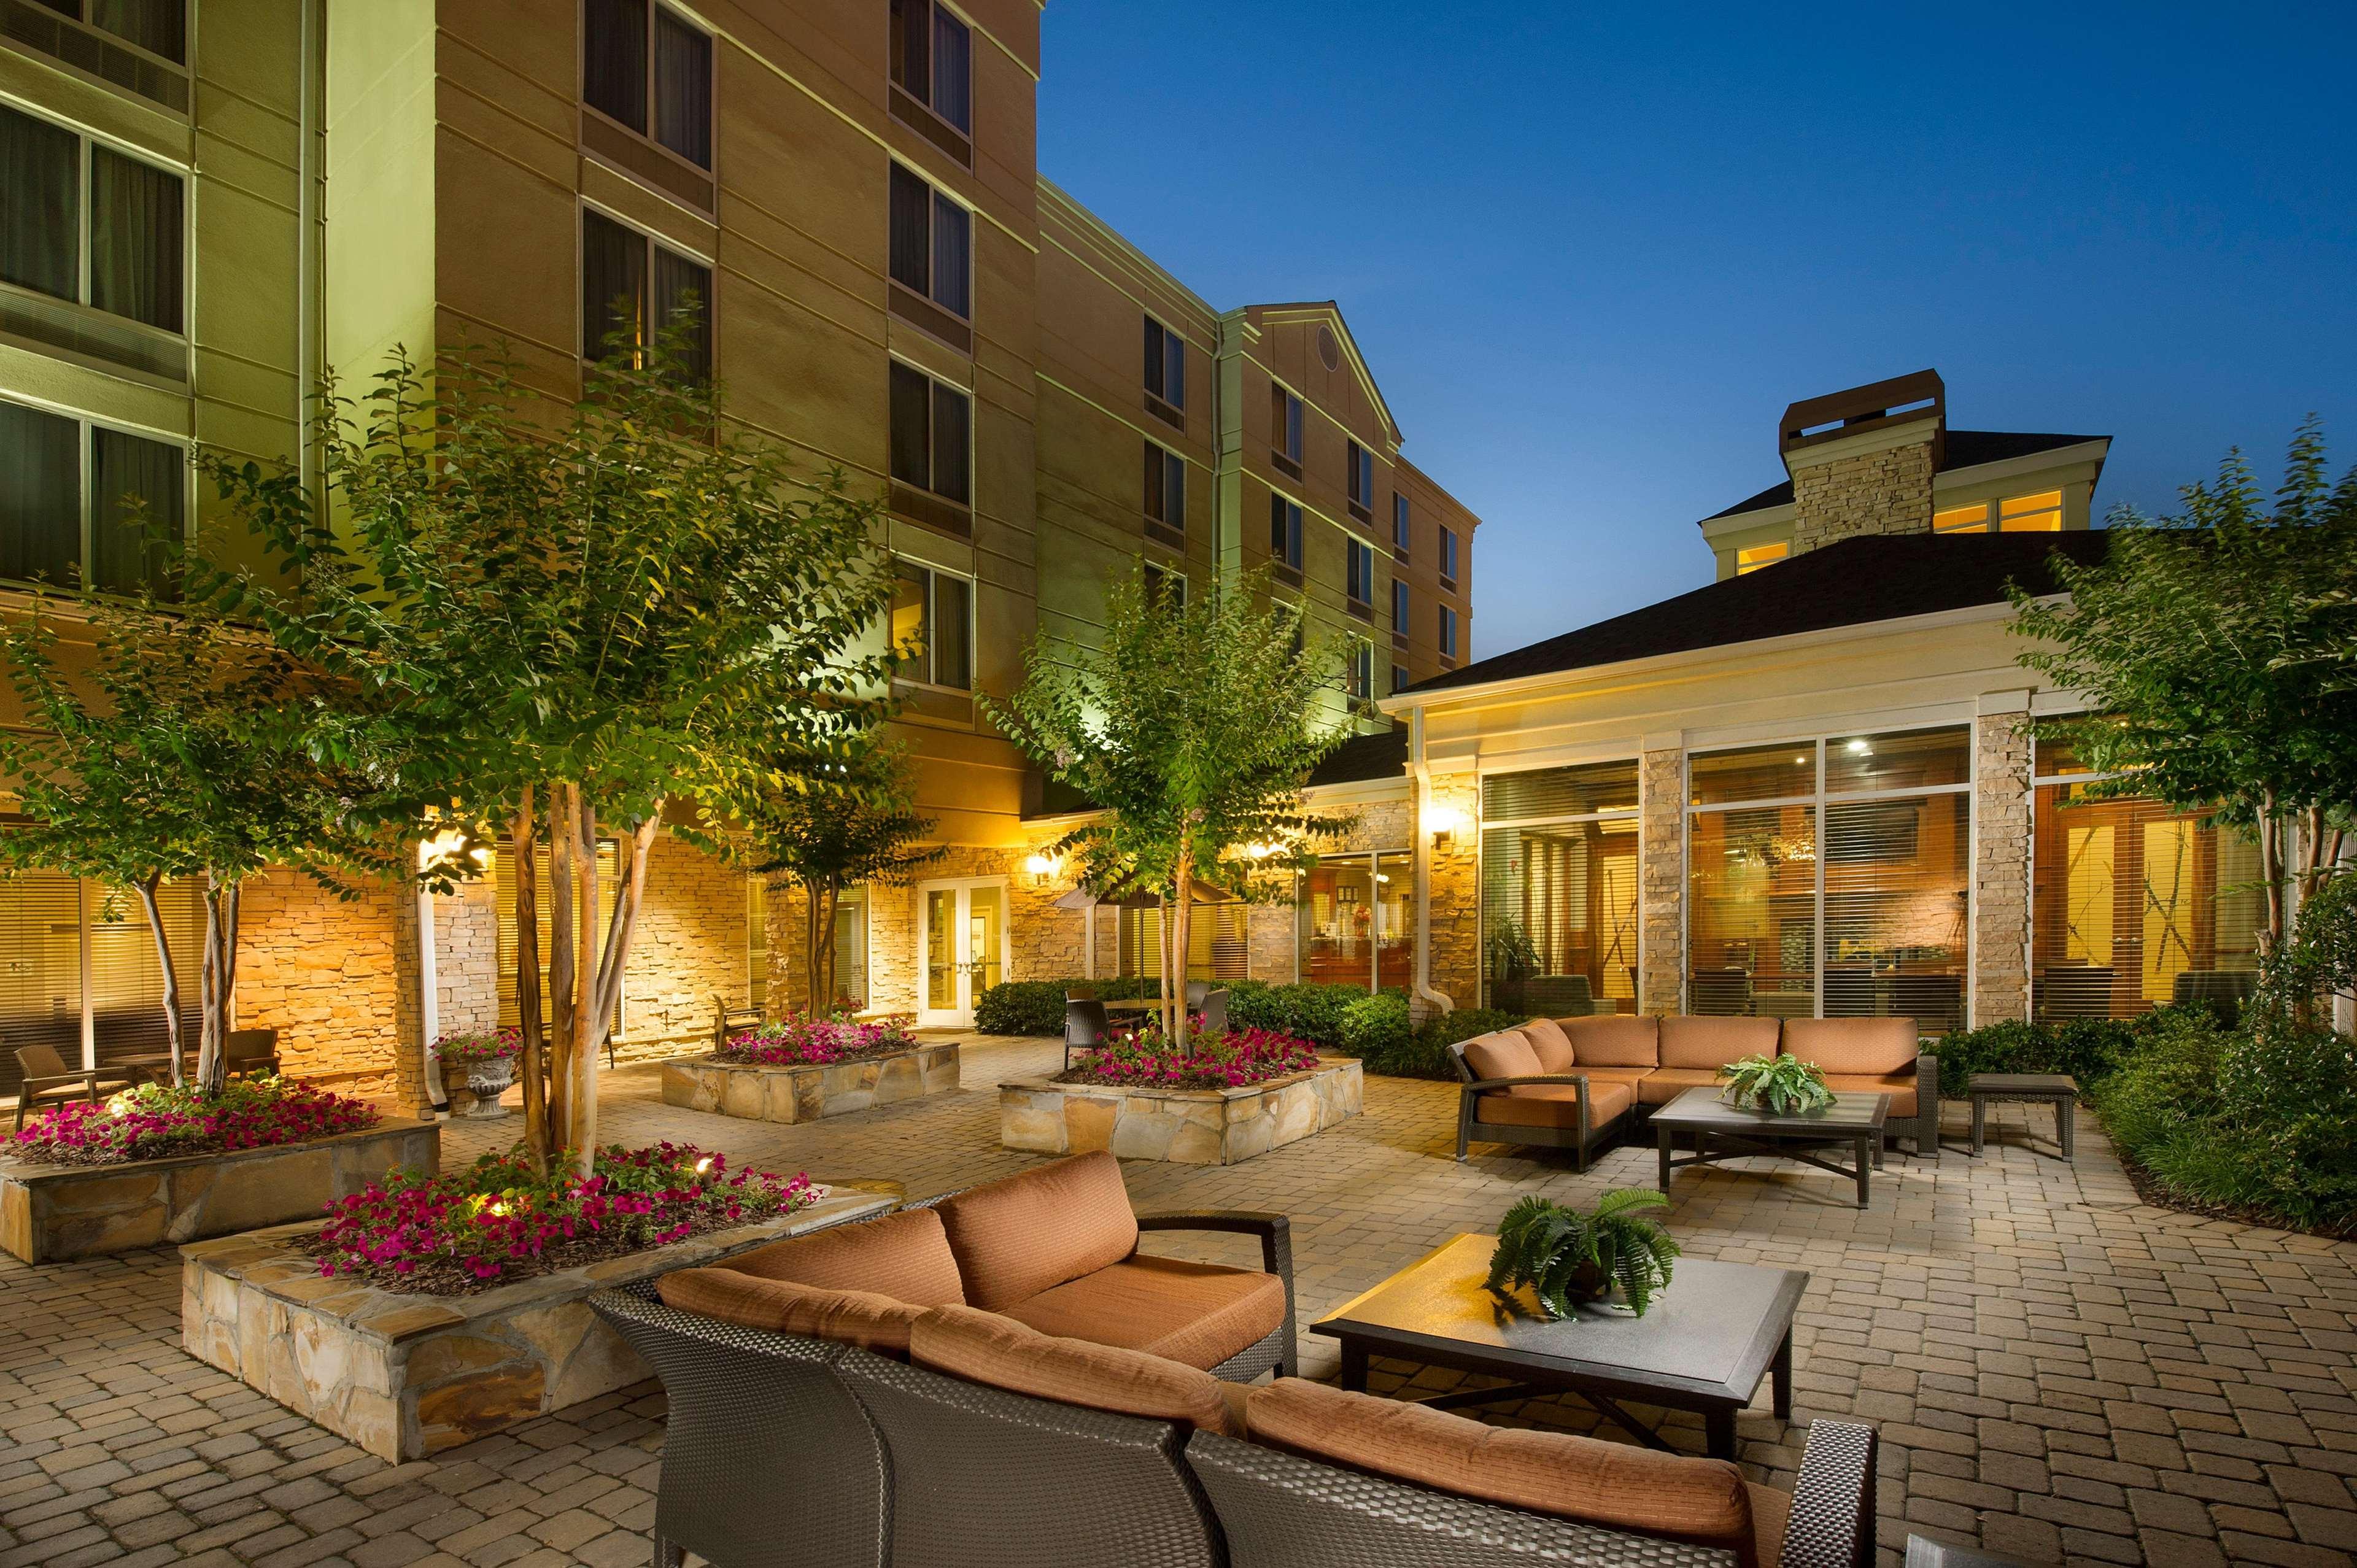 Hilton Garden Inn Atlanta NW/Kennesaw Town Center